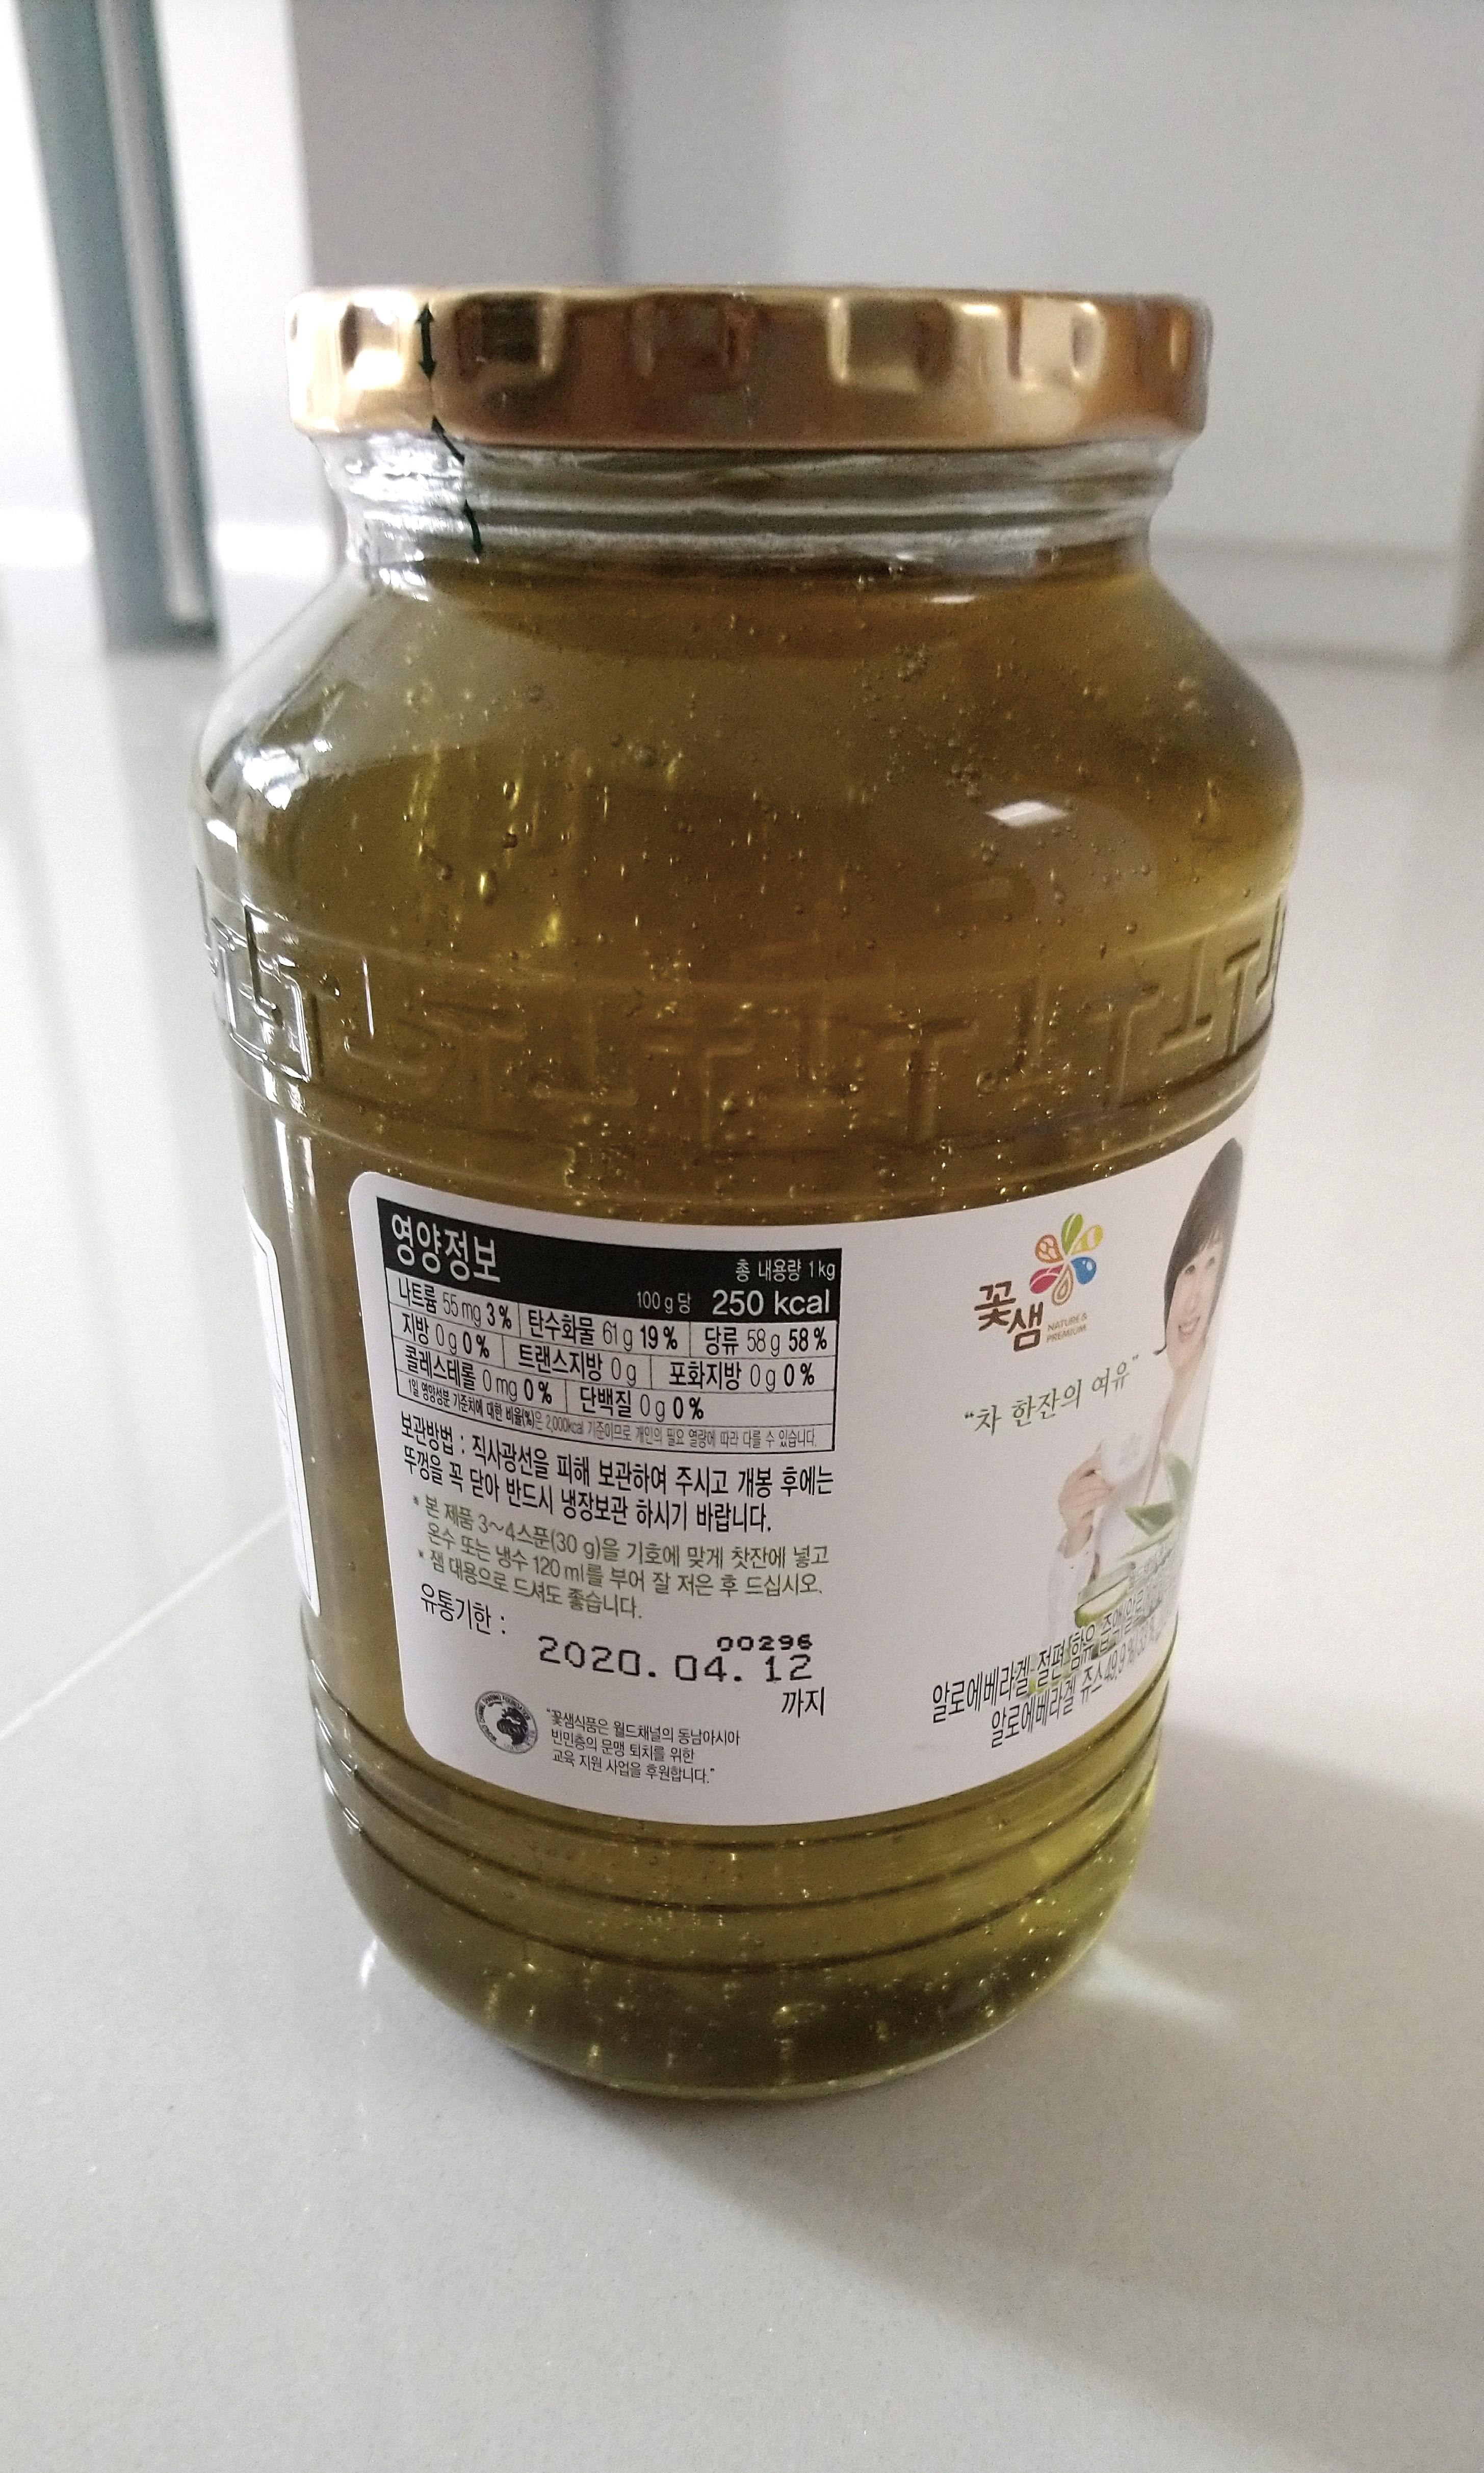 Brand new Korean Kkoh Shaem Honey Aloe Tea Concentrate